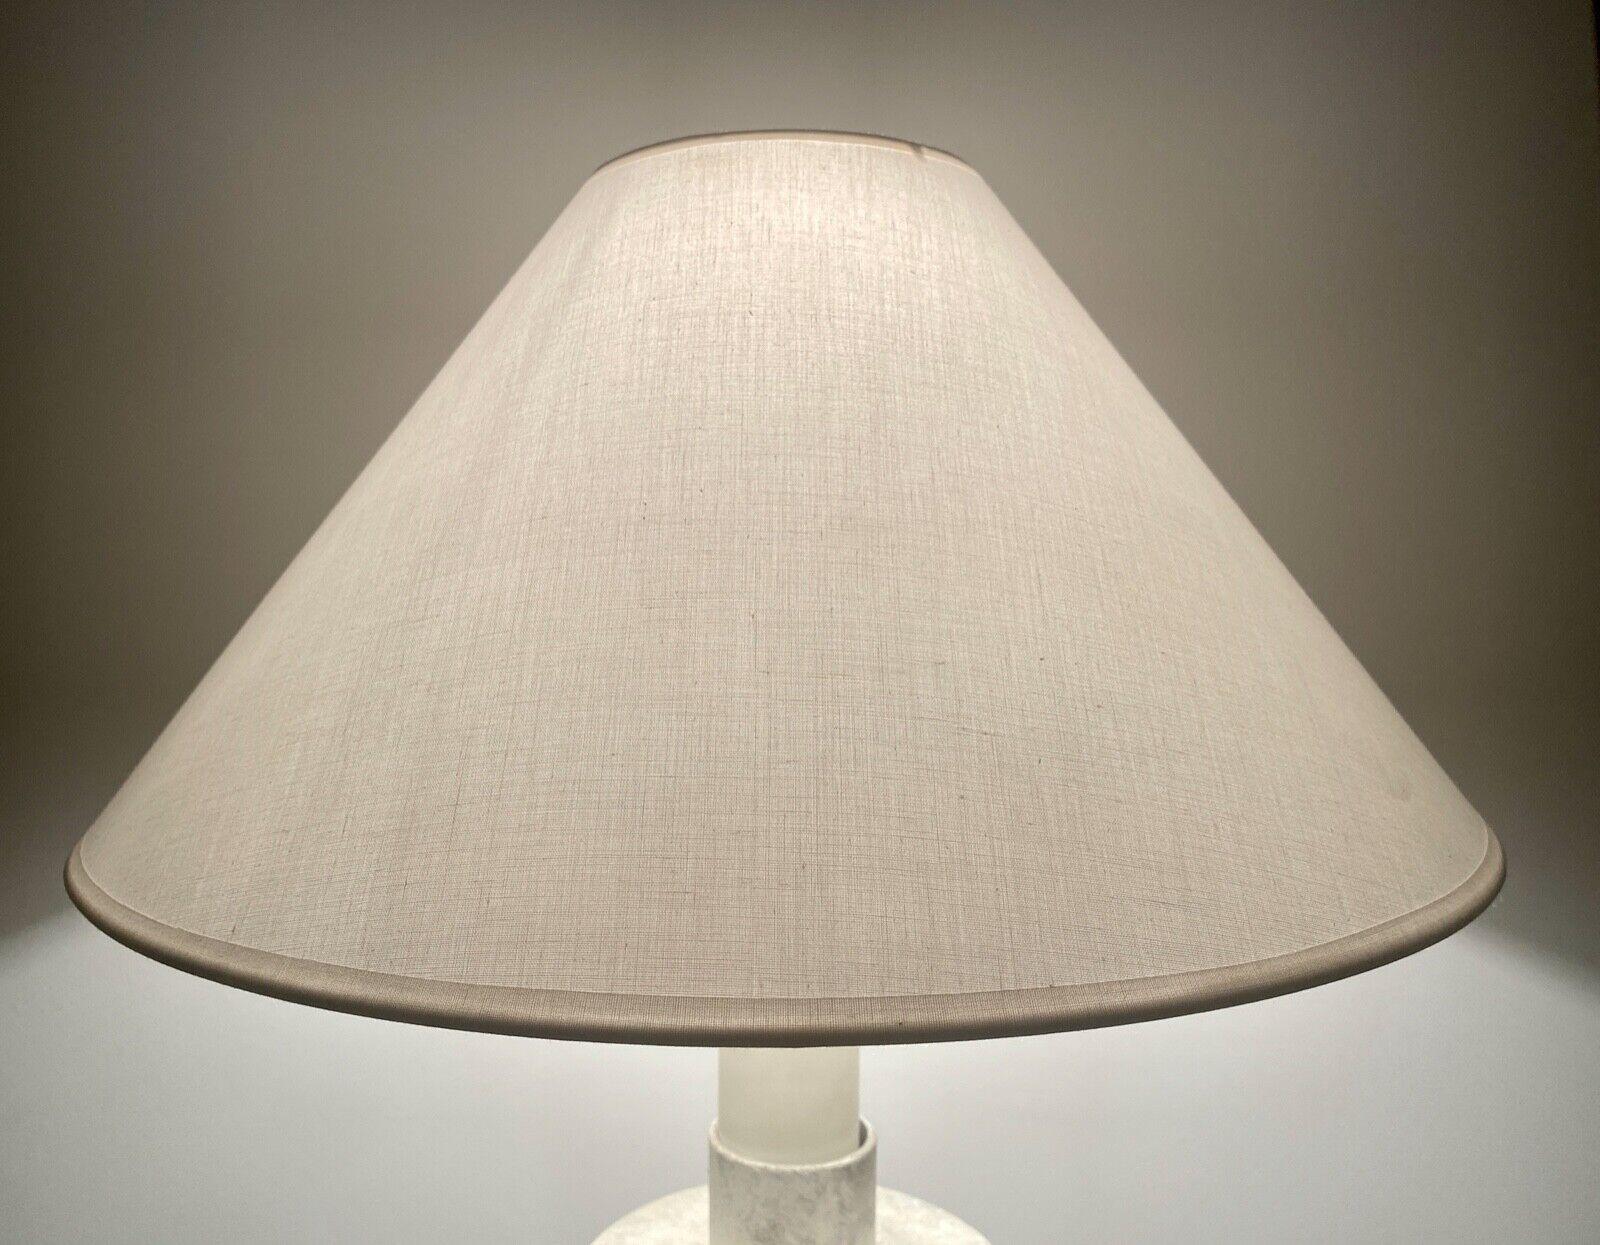 WHITE FLARE Hardback LAMPSHADE Versatile IMPERFECT CuTe 032620 Modern FINE LINEN